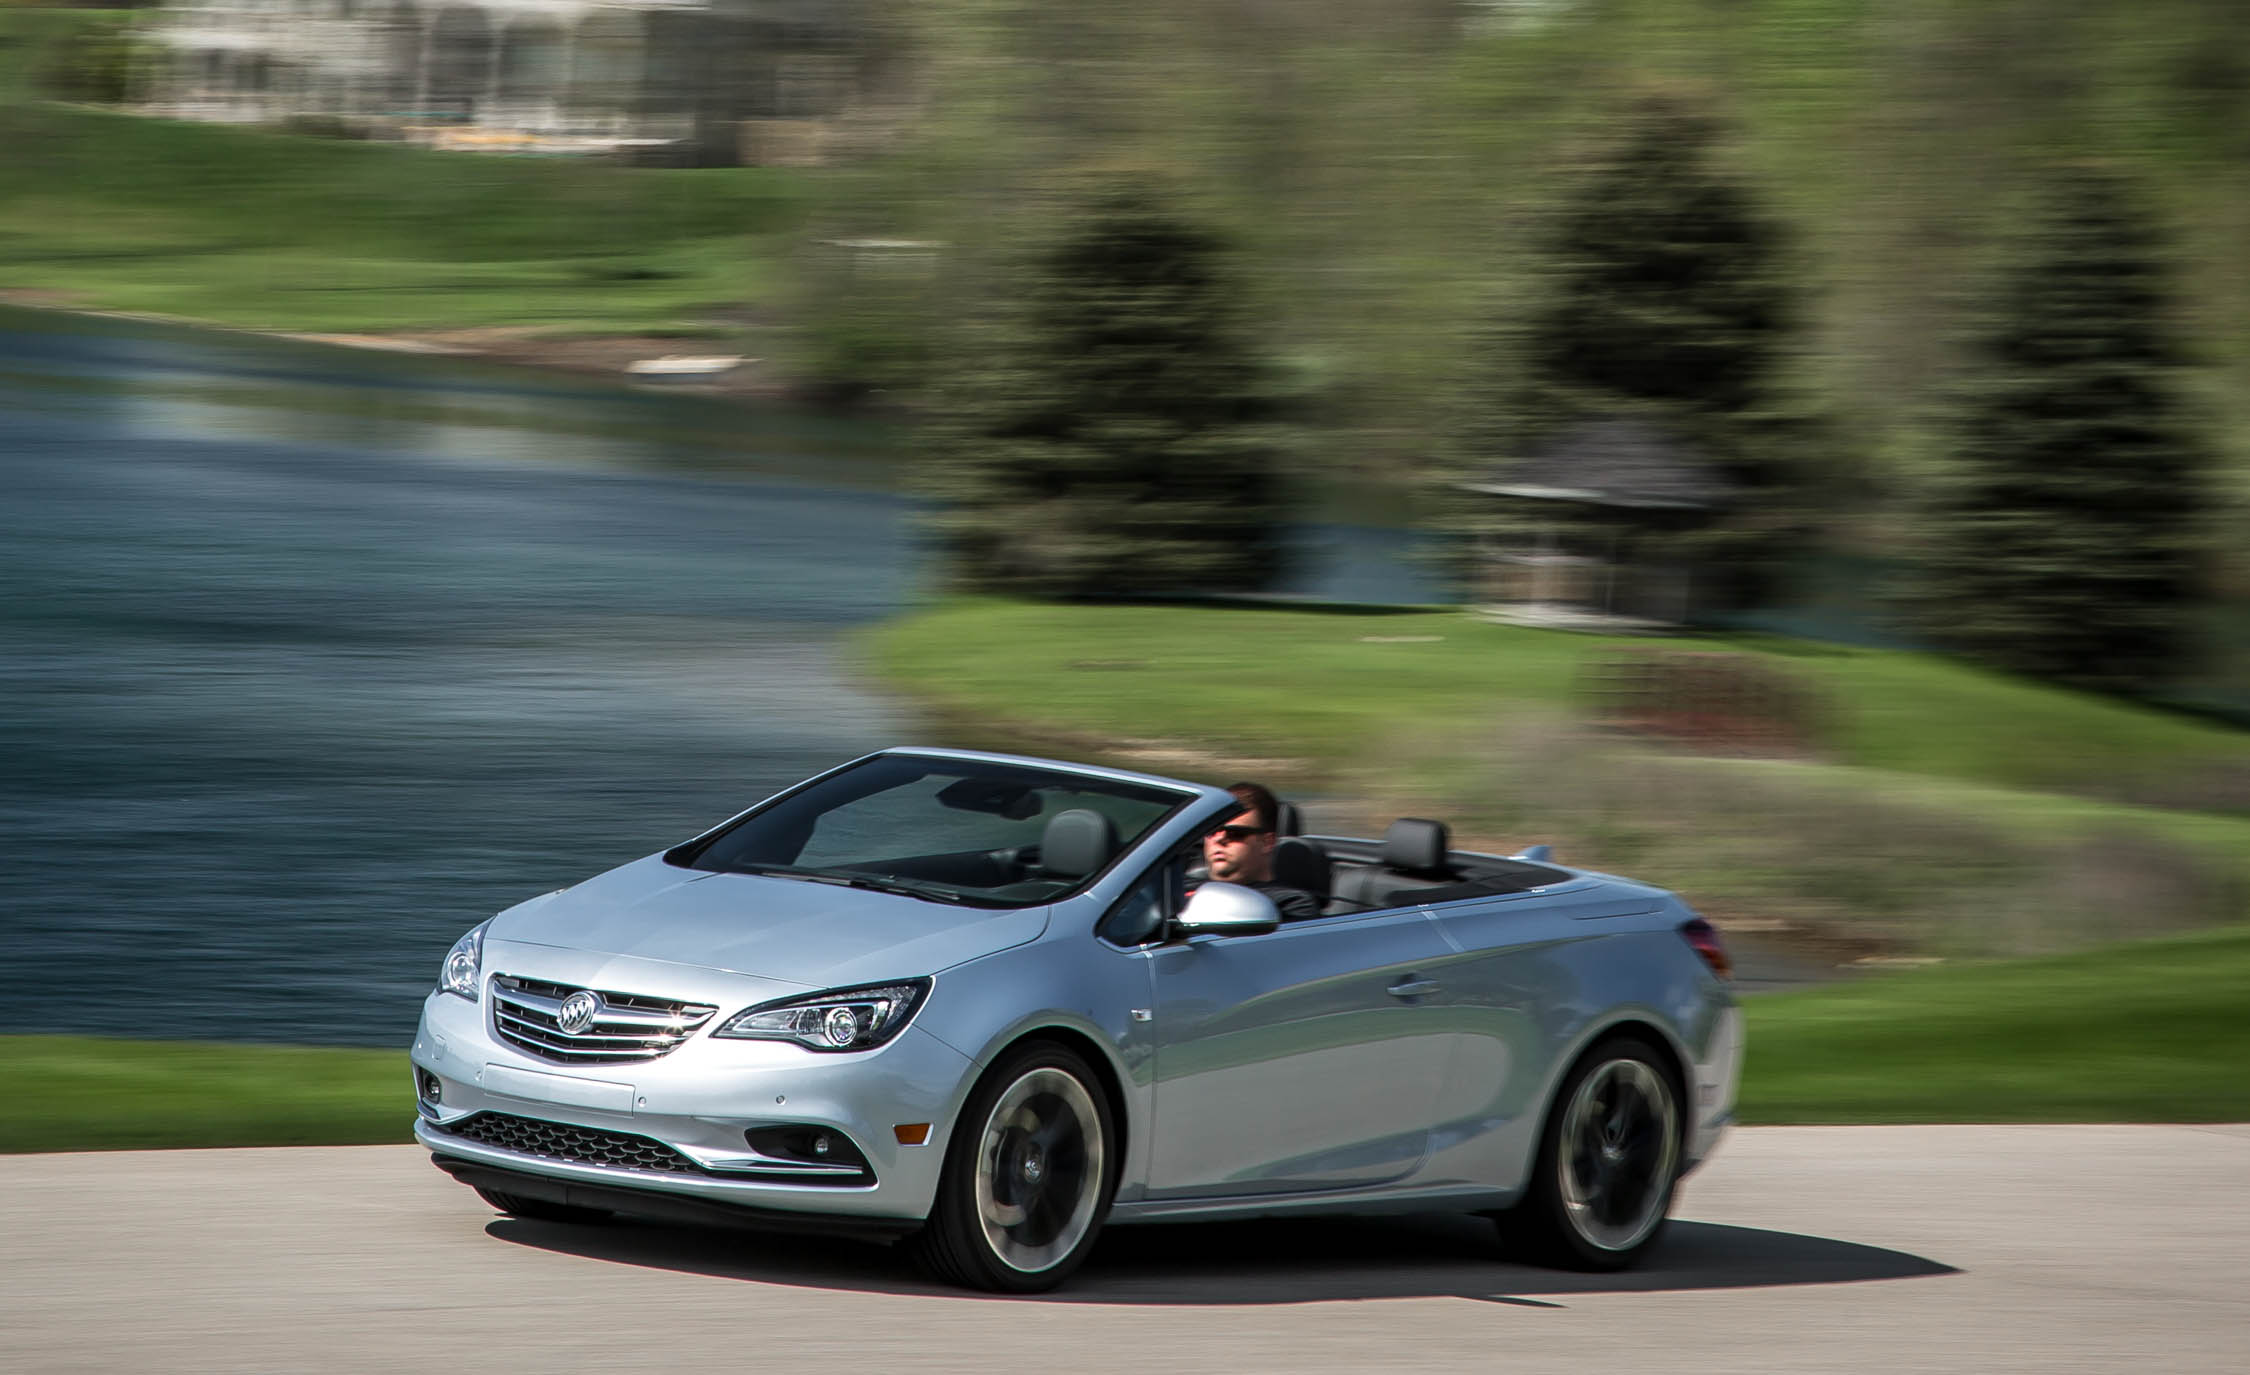 2016 Buick Cascada Premium (Photo 12 of 24)